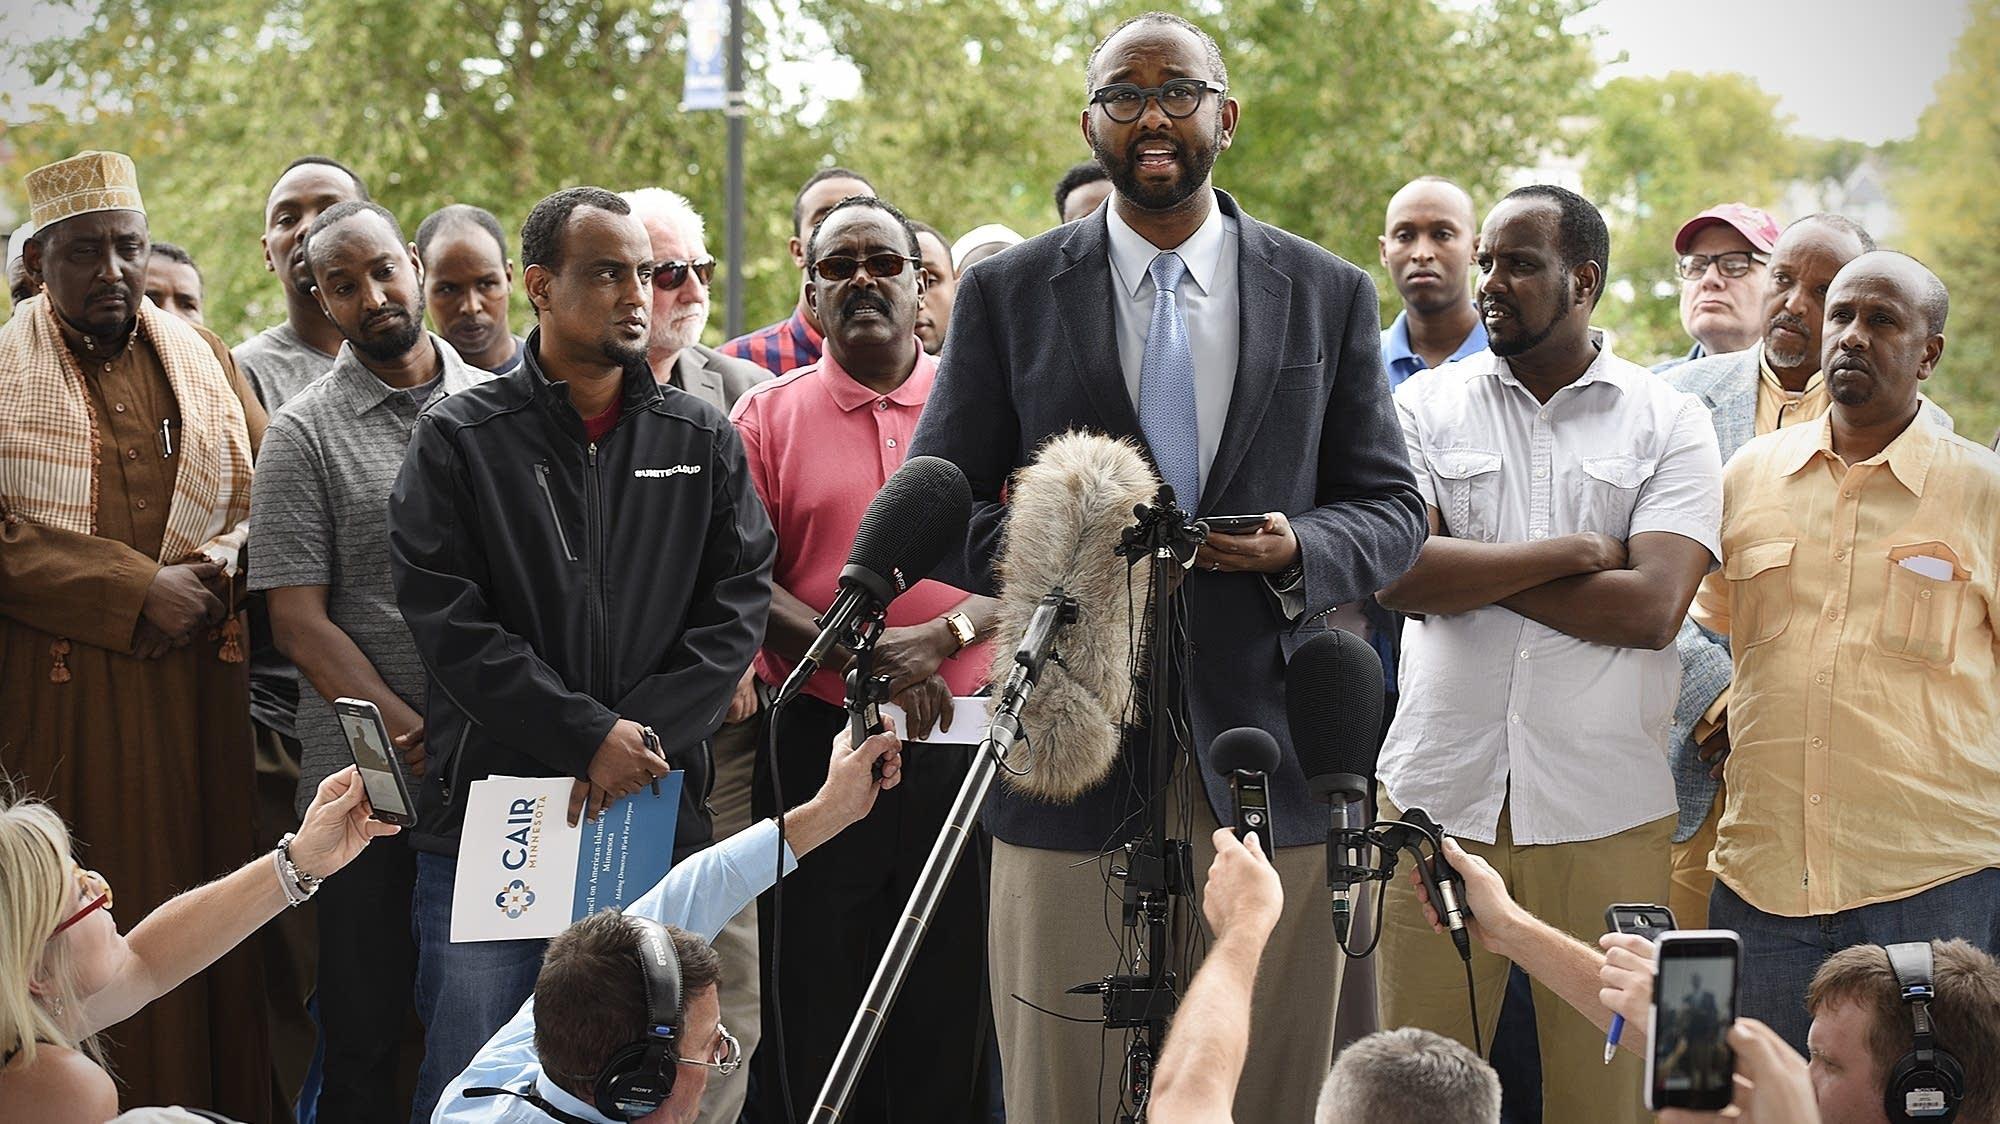 Somali-American community leaders